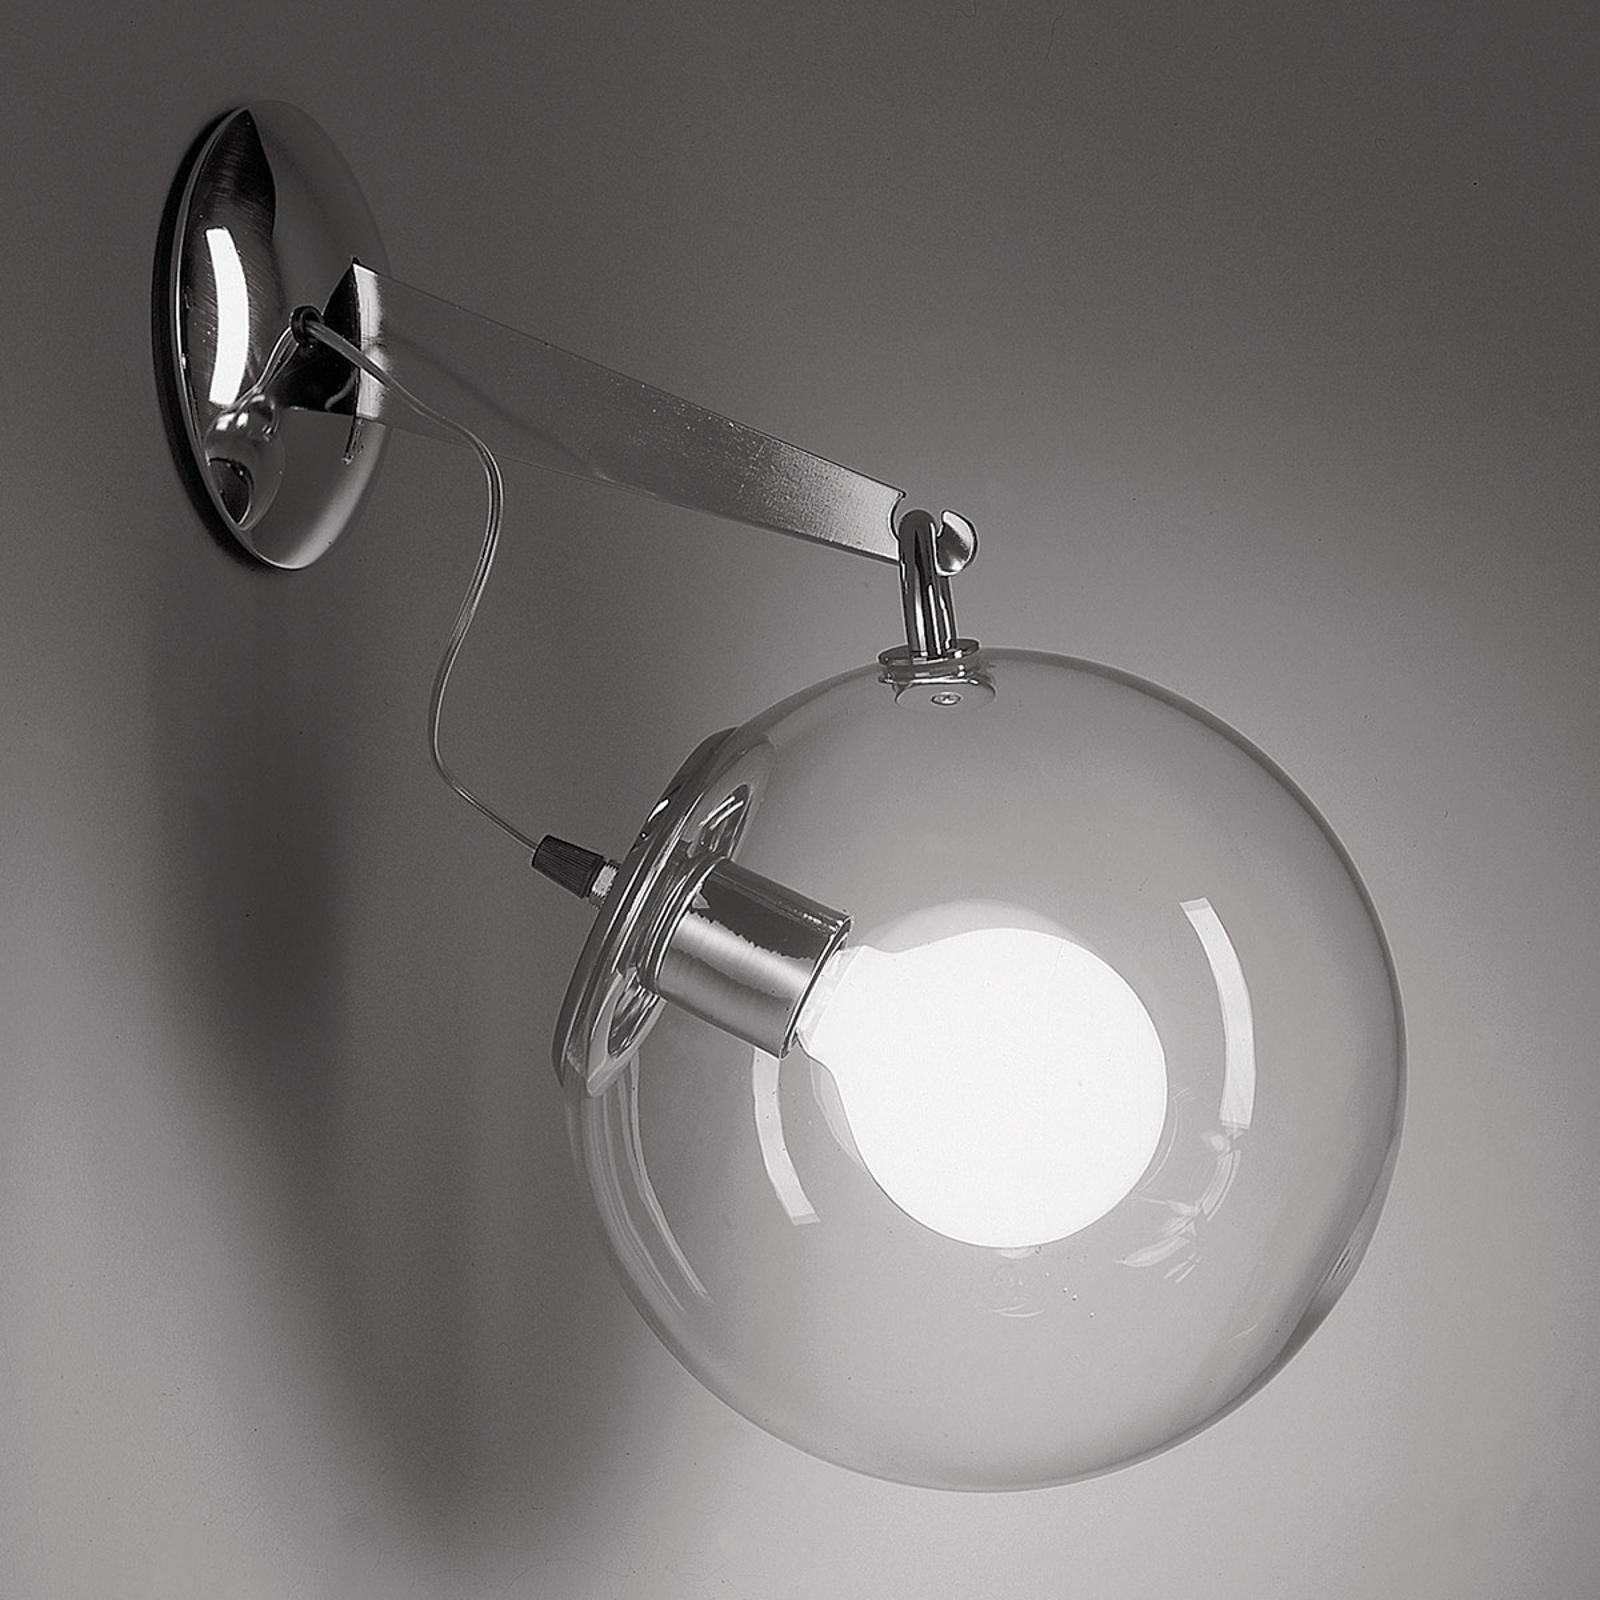 Artemide Miconos Glas-Wandleuchte in Chrom